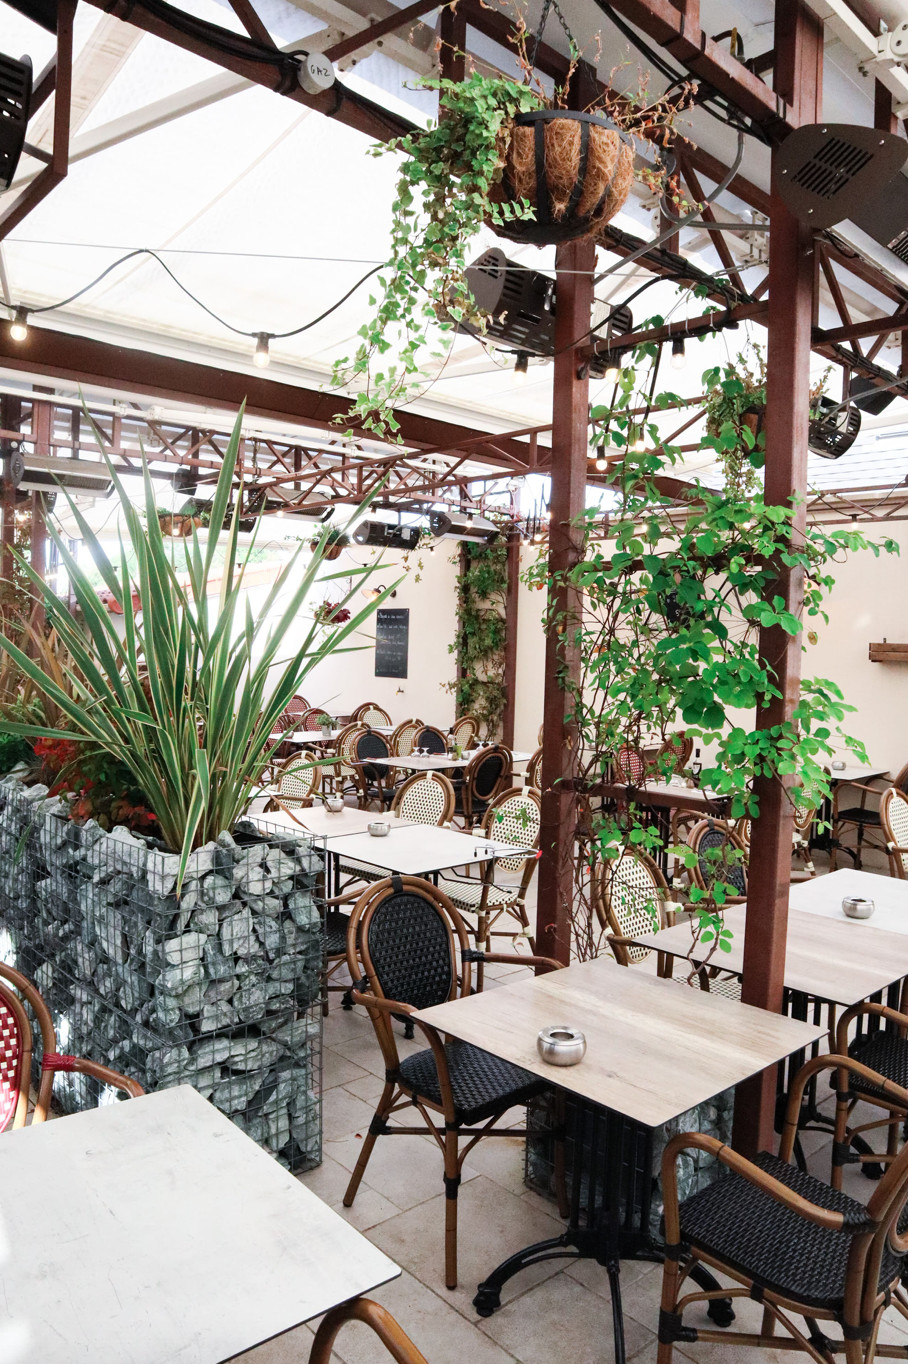 Restaurant italien Val-de-marne